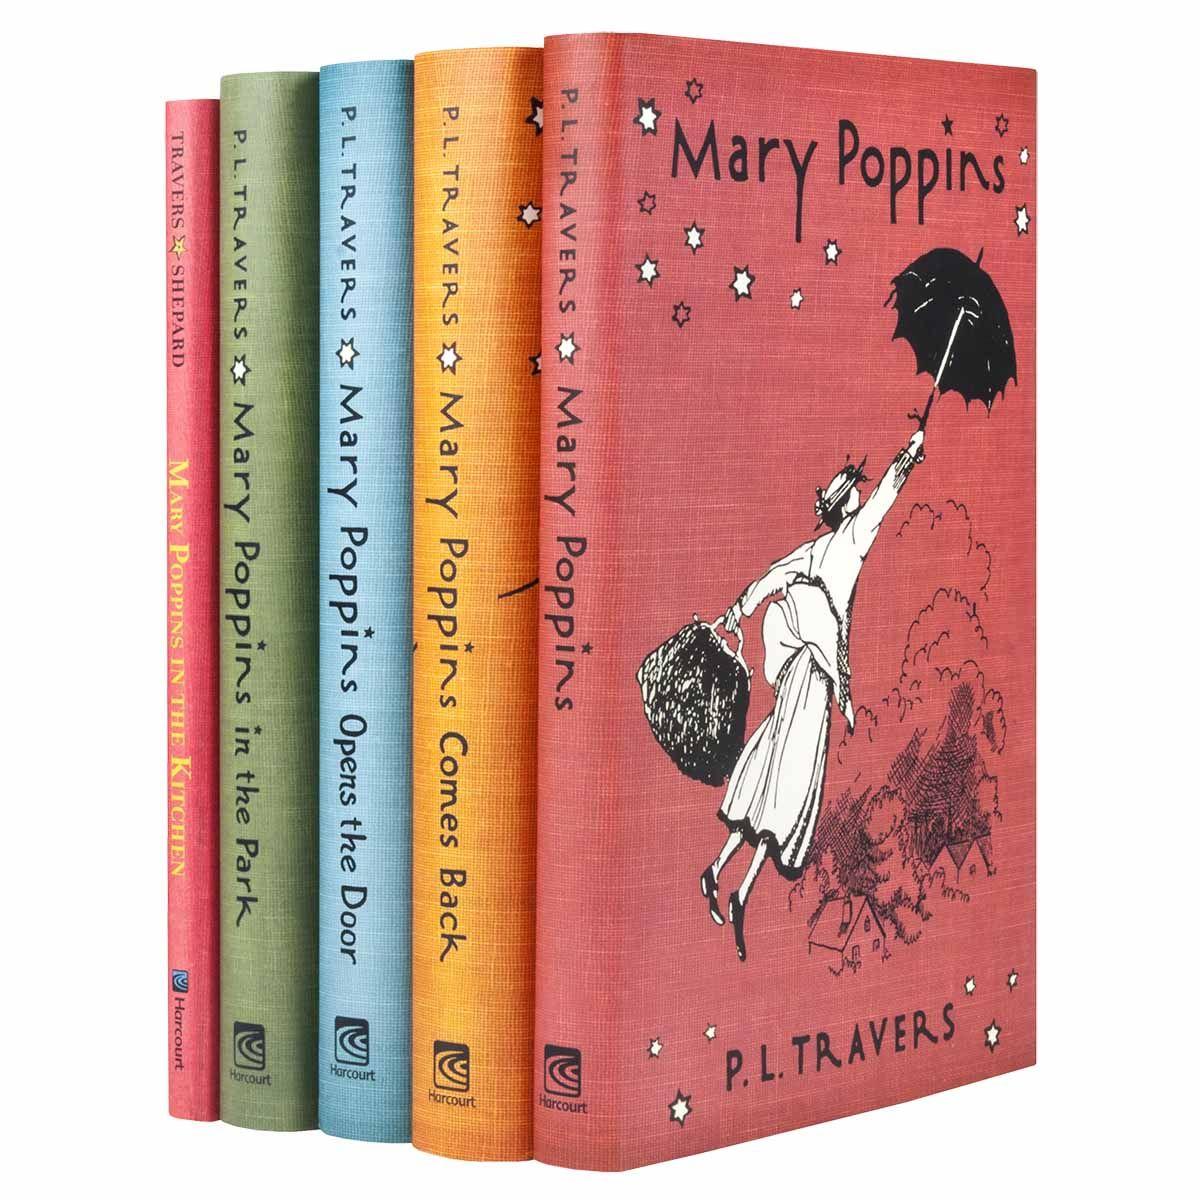 Mary Poppins Set Juniper Books Mary Poppins Mary Poppins Book Poppins